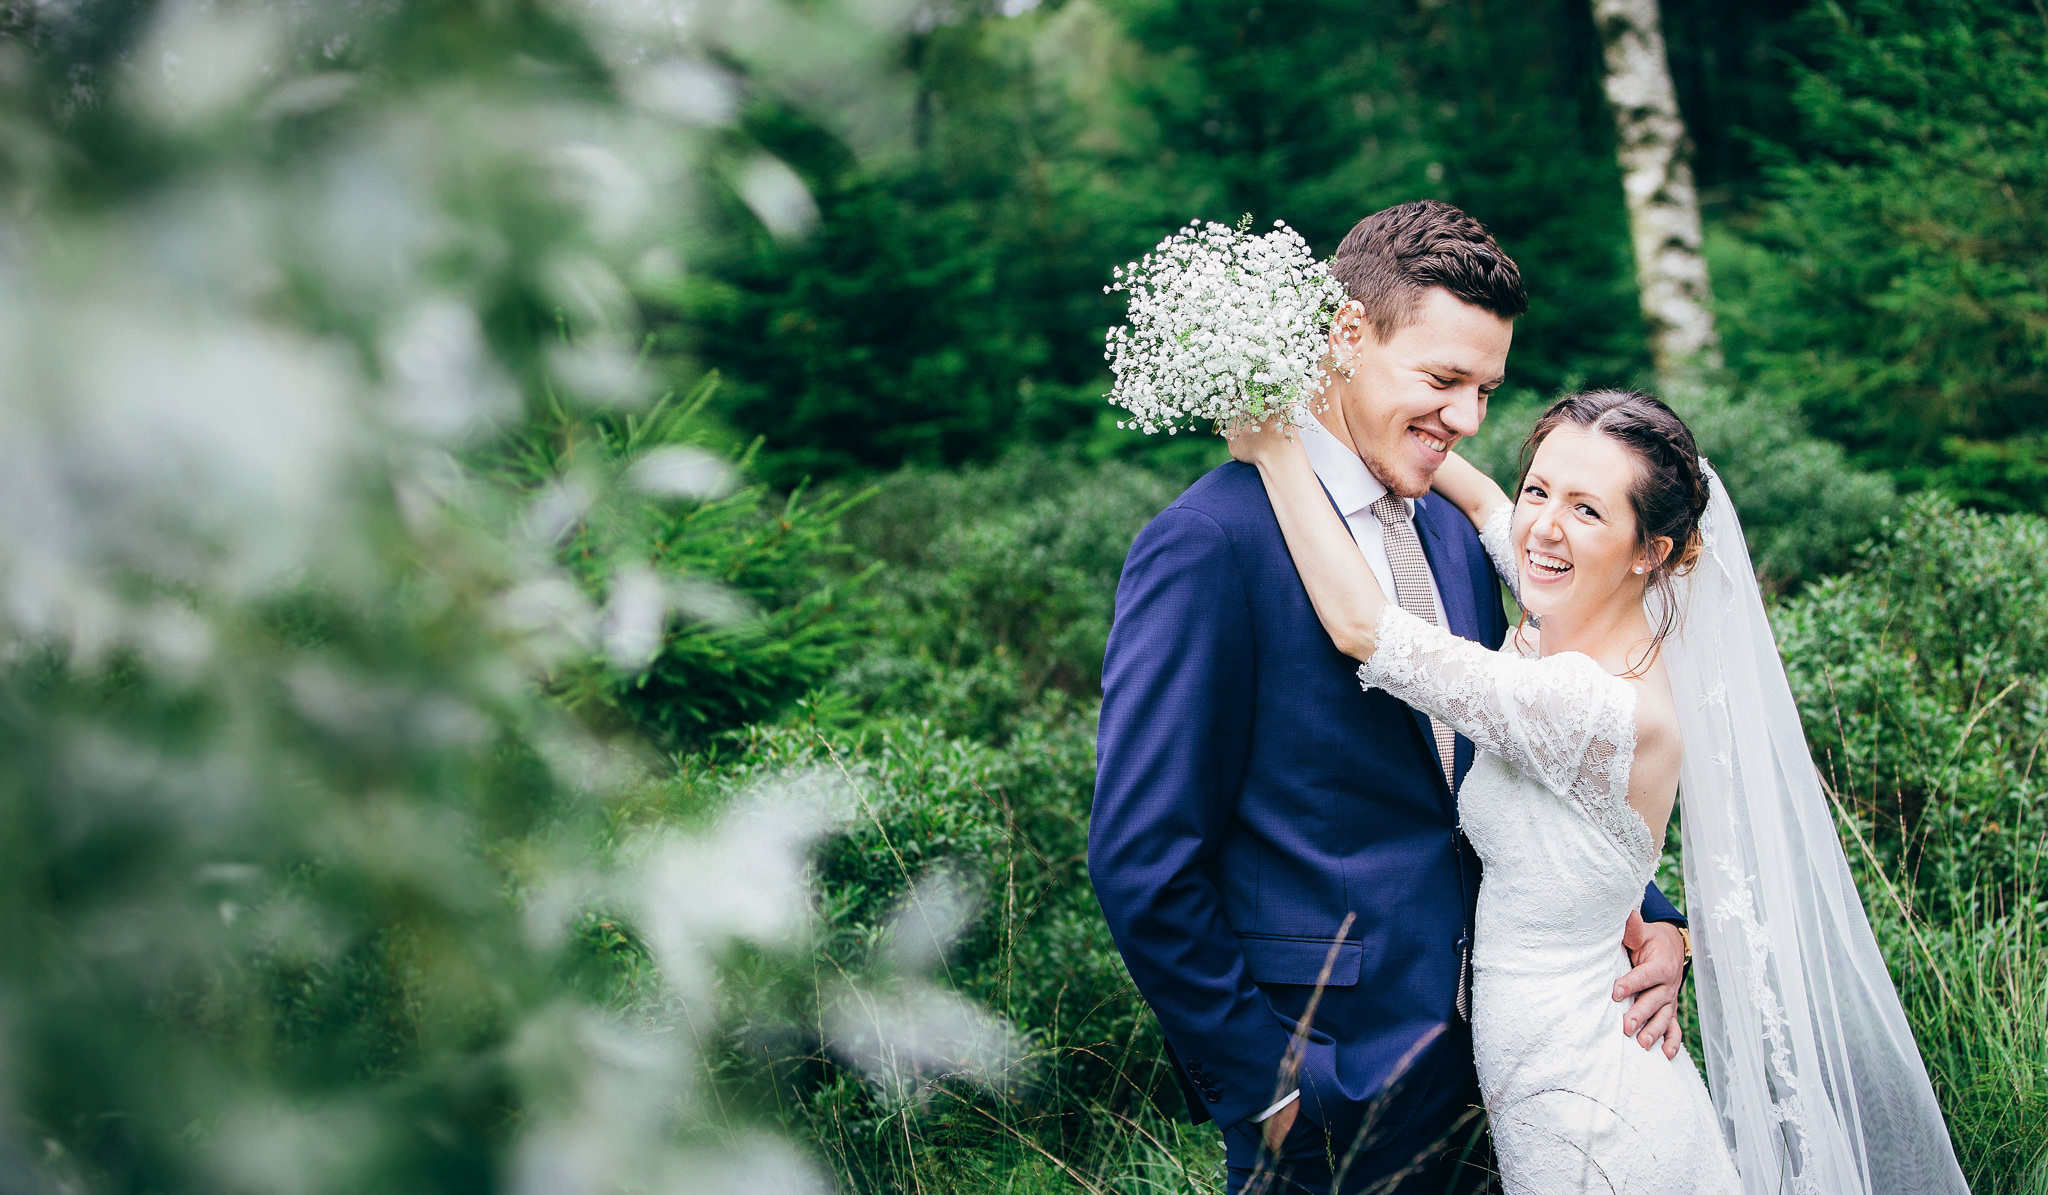 Norway+wedding+photographer+elopement+pre+wedding+Rogaland+bryllupsfotograf+Casey+Arneson-128.jpg